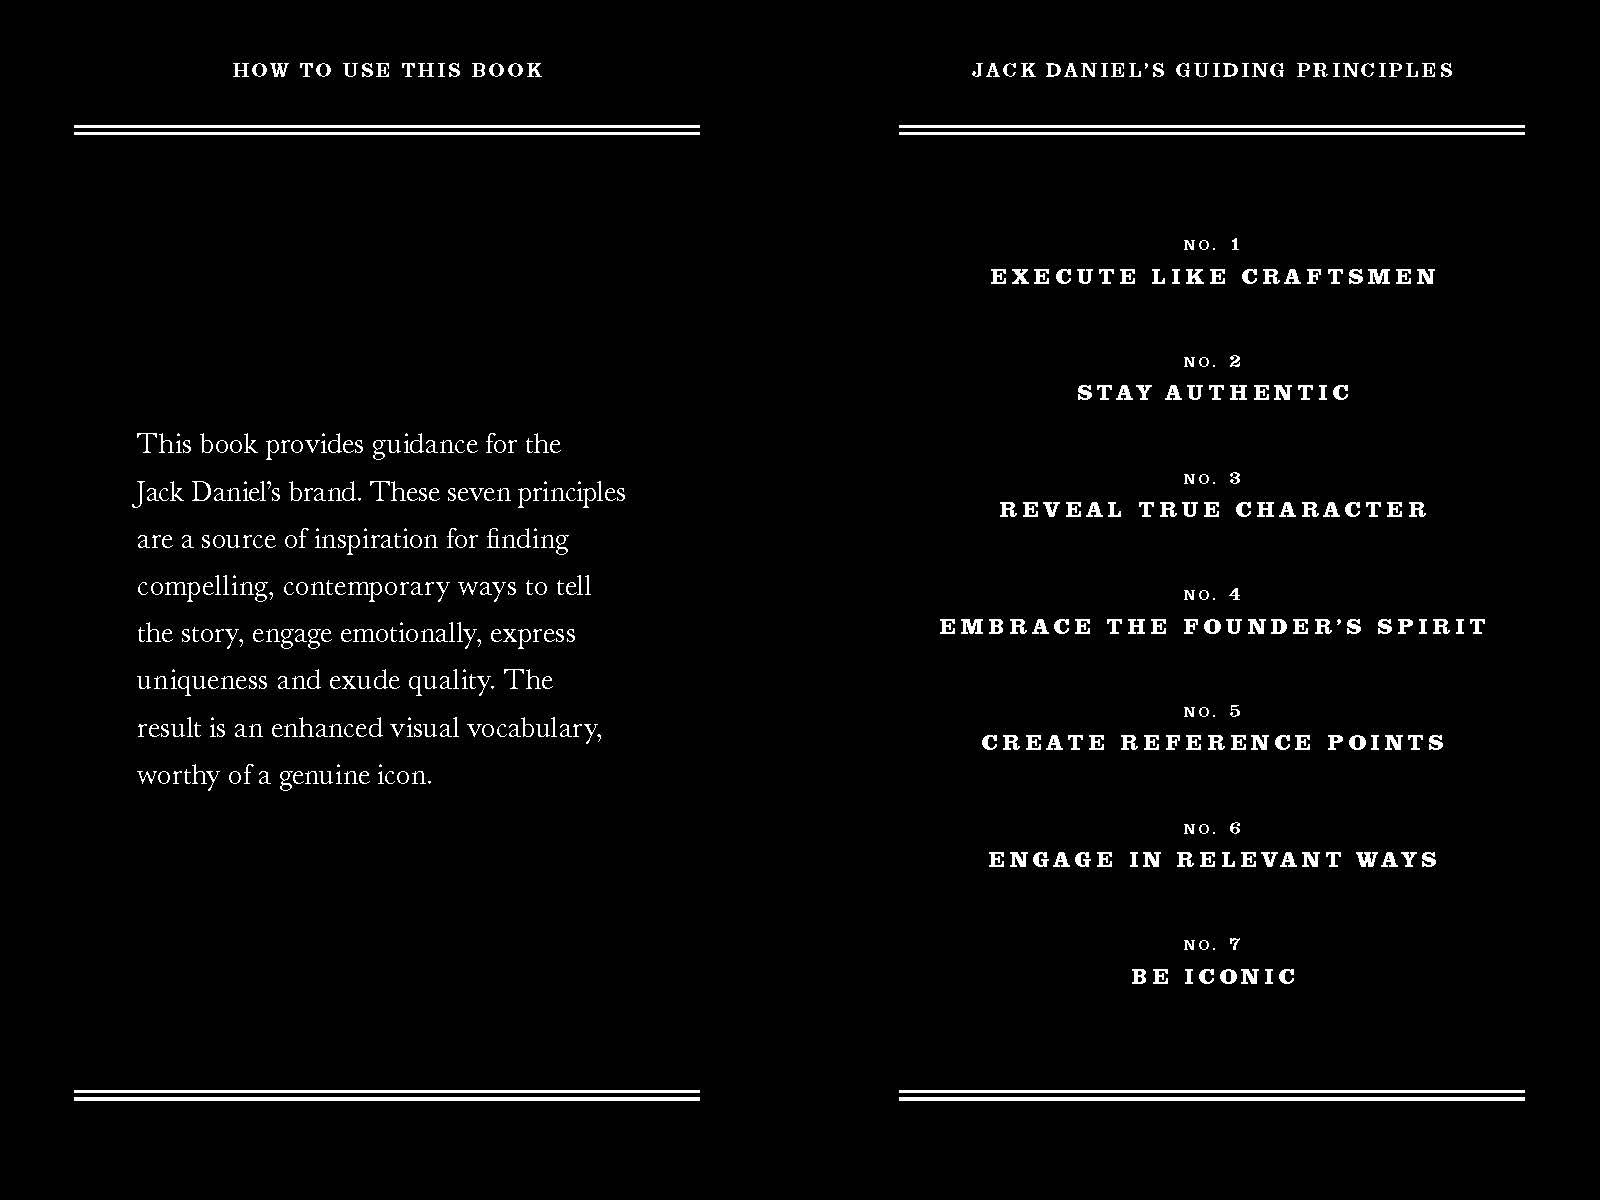 Jack Daniel's Guiding Principles 2012_Page_03.jpg